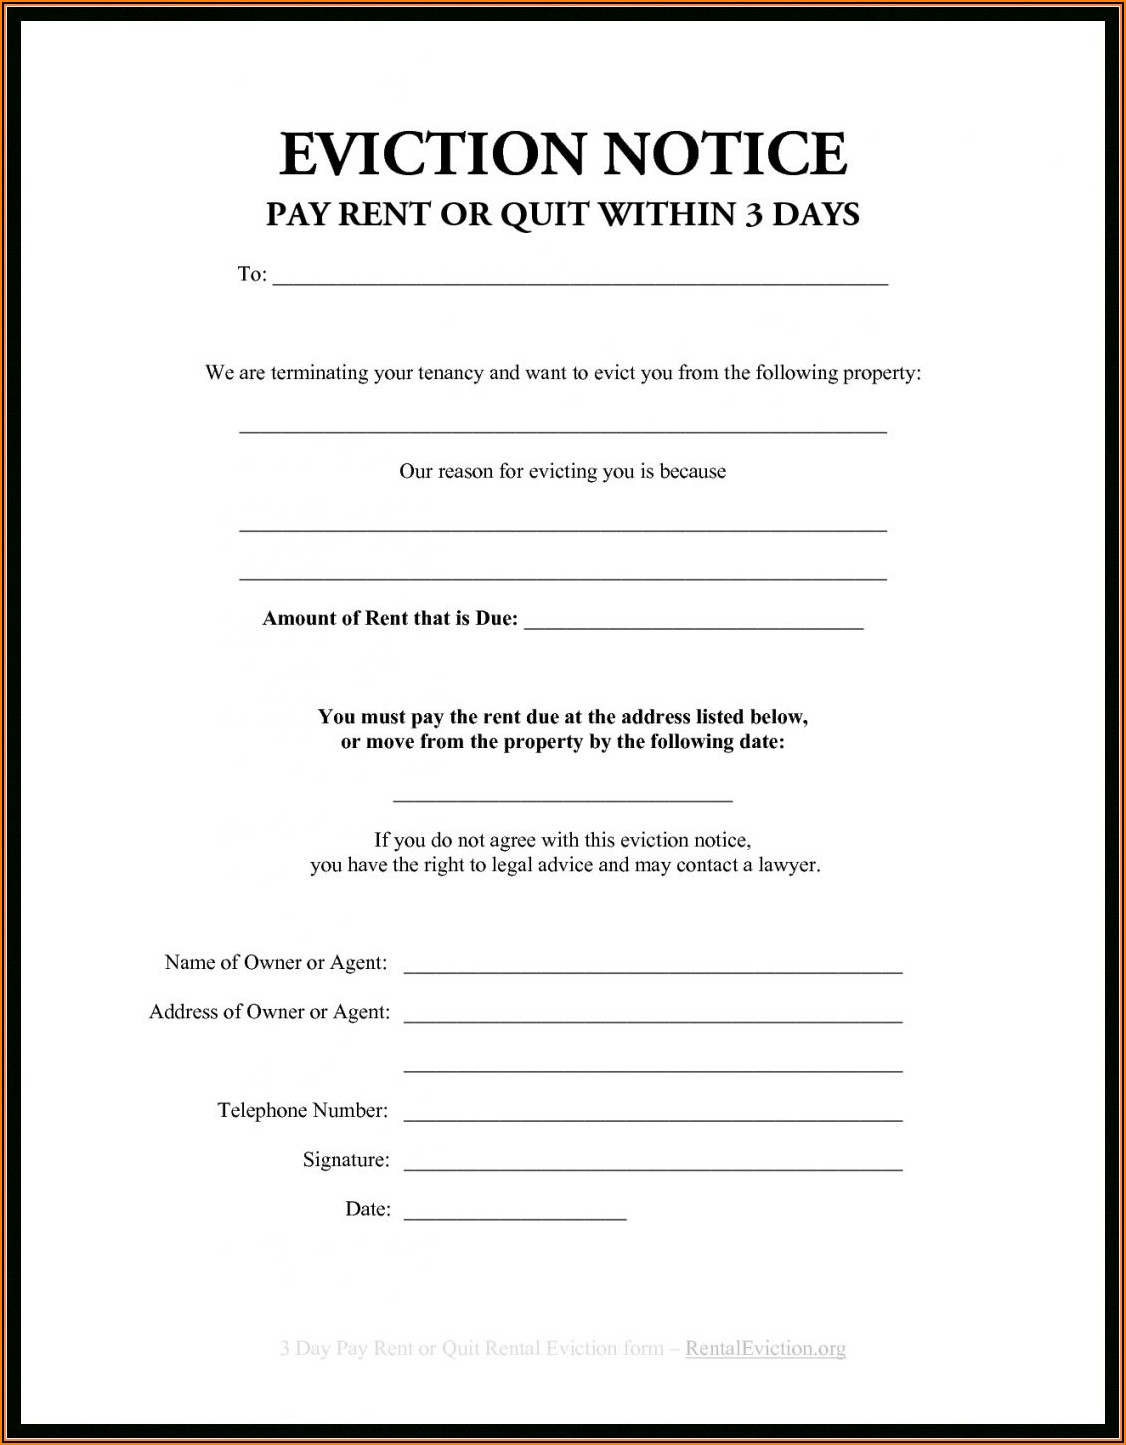 Alberta Landlord Eviction Notice Form